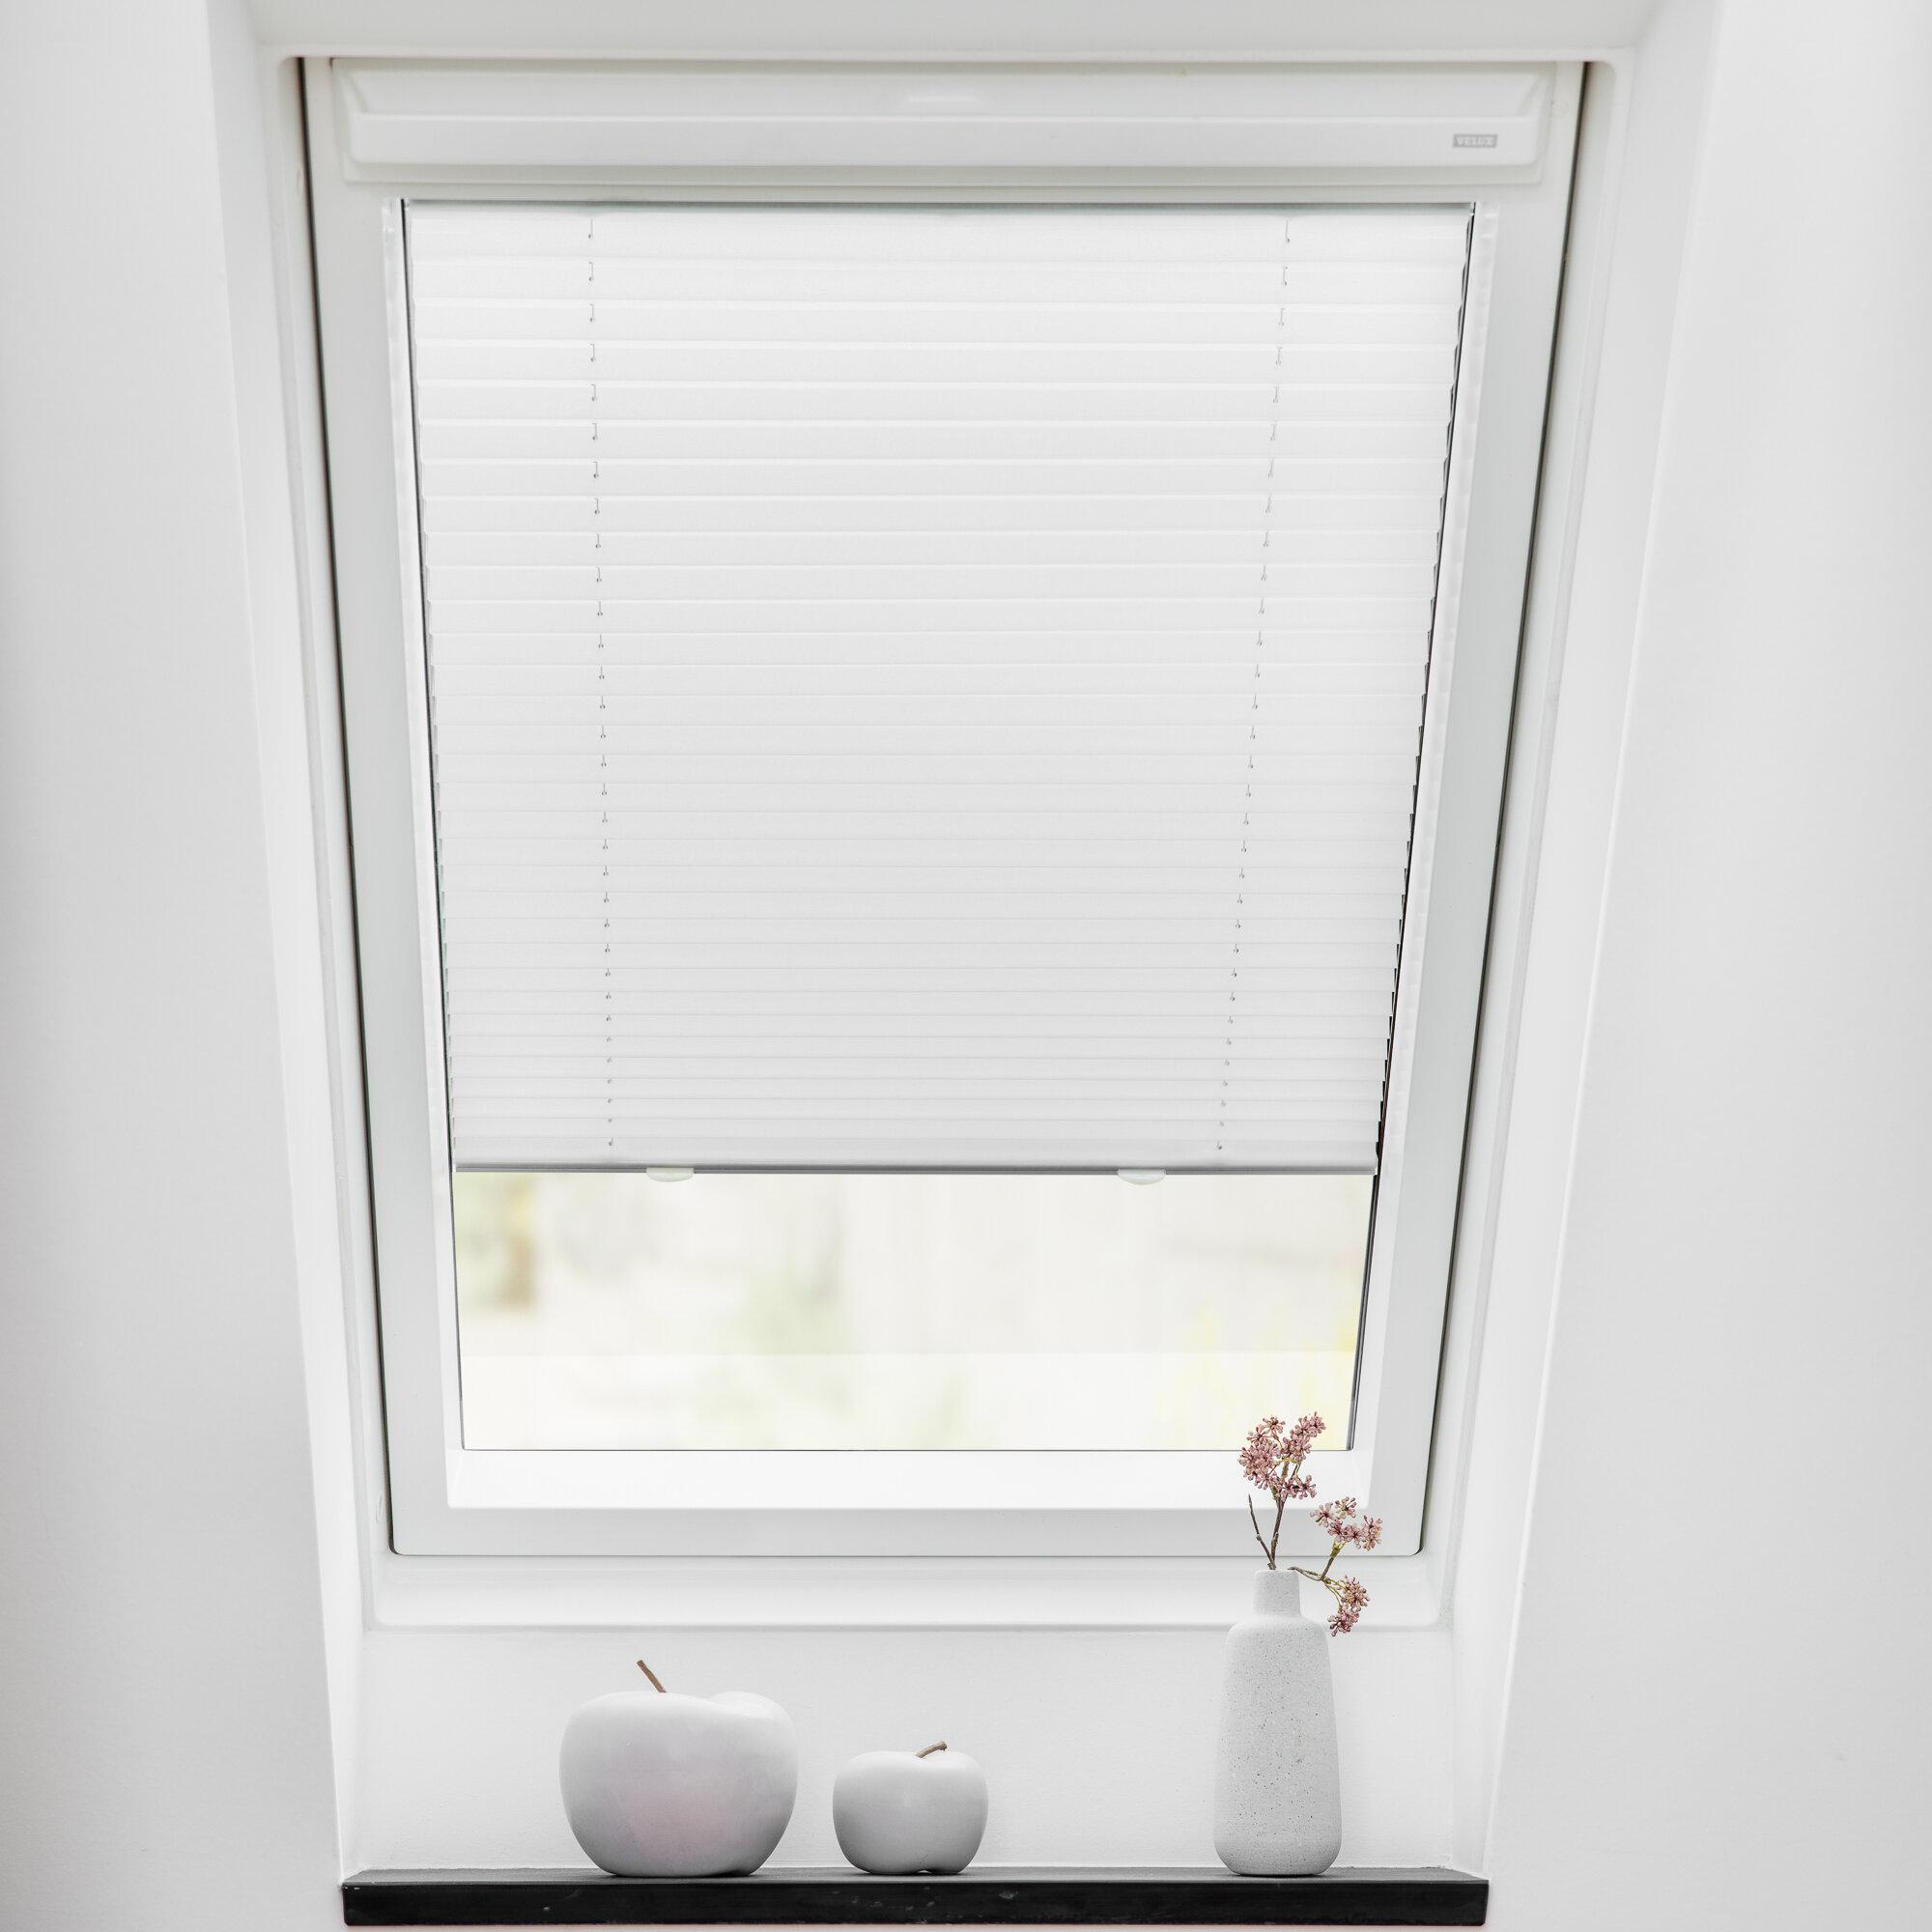 Clearambient Dachfenster Plissee Haftfix Bewertungen Wayfair De